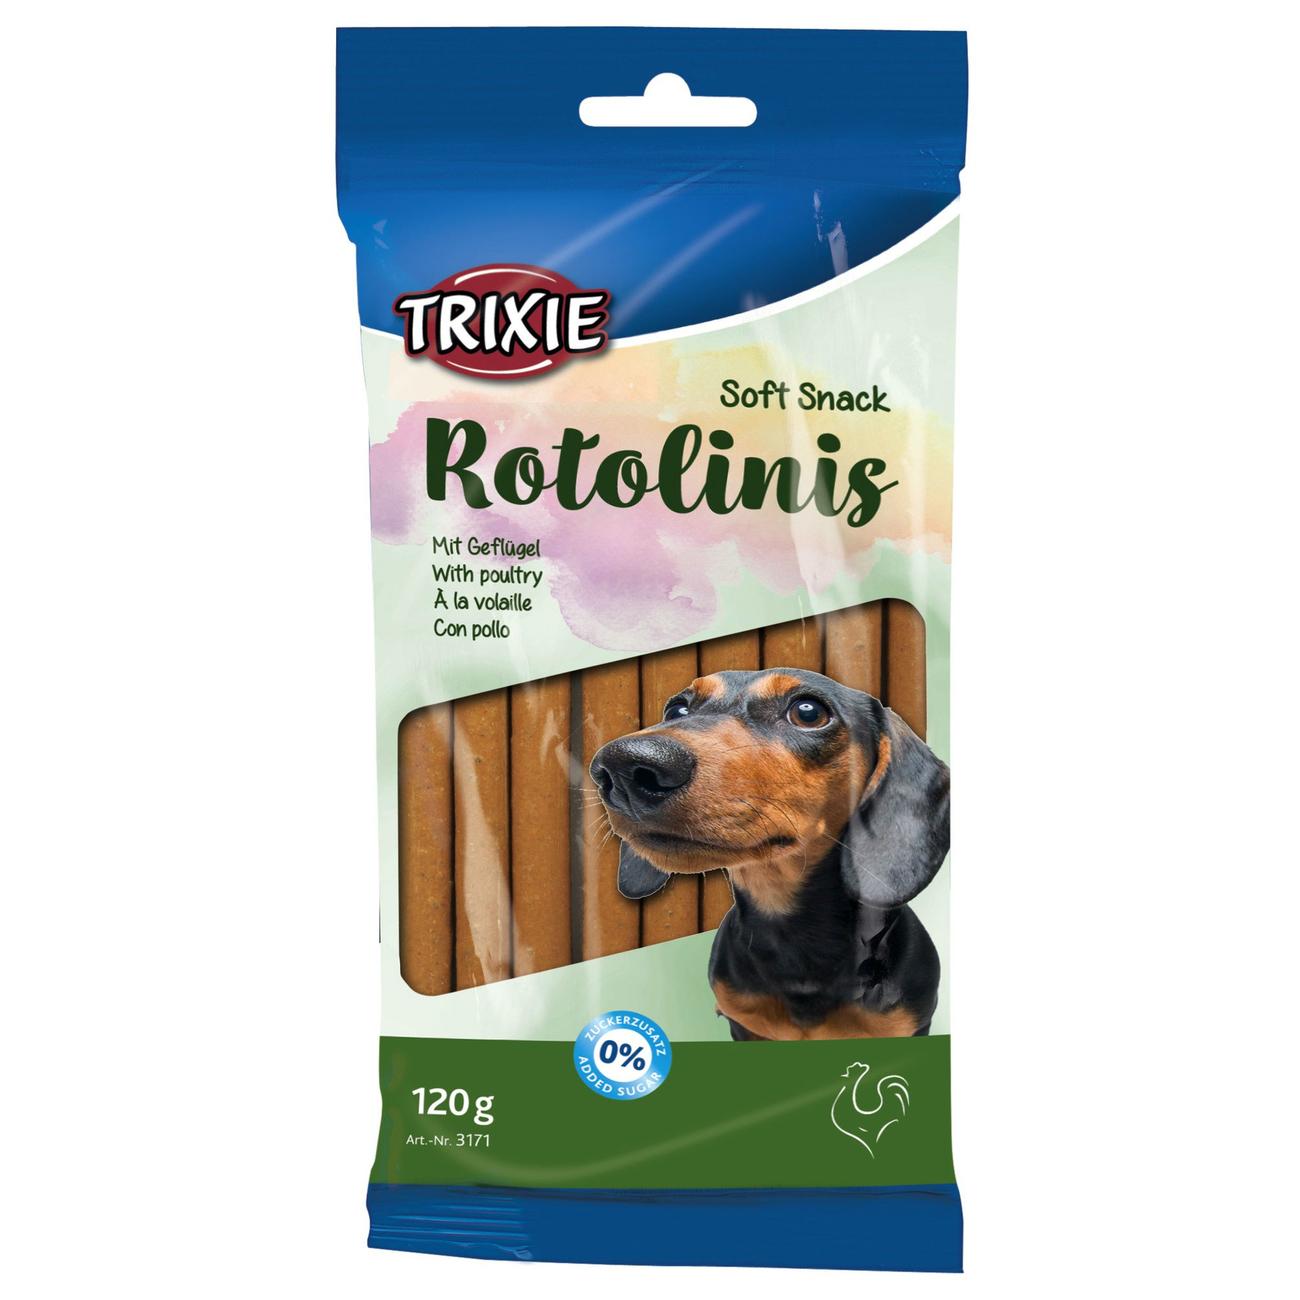 Trixie Kaustangen Hund Rotolinis 3171, Bild 2